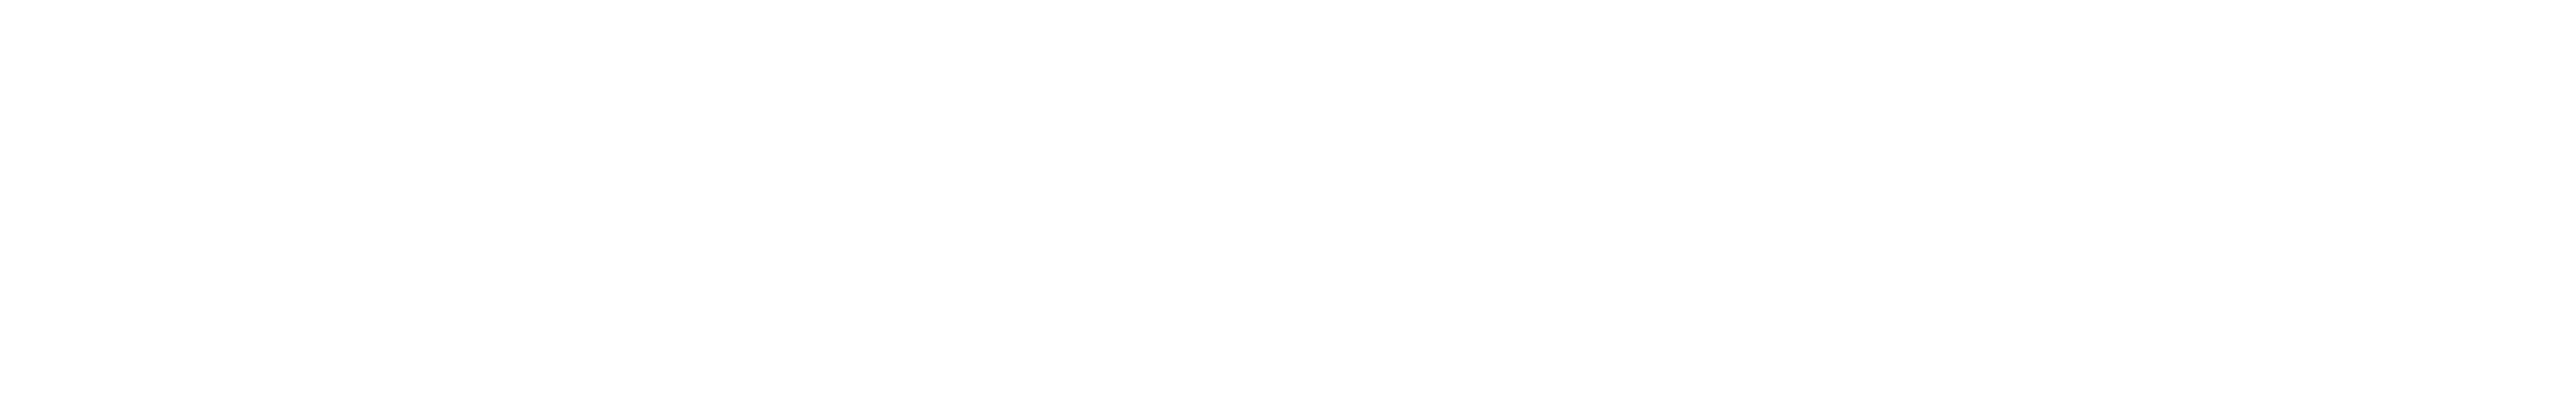 Brand logos for GE Appliances, a Haier Company